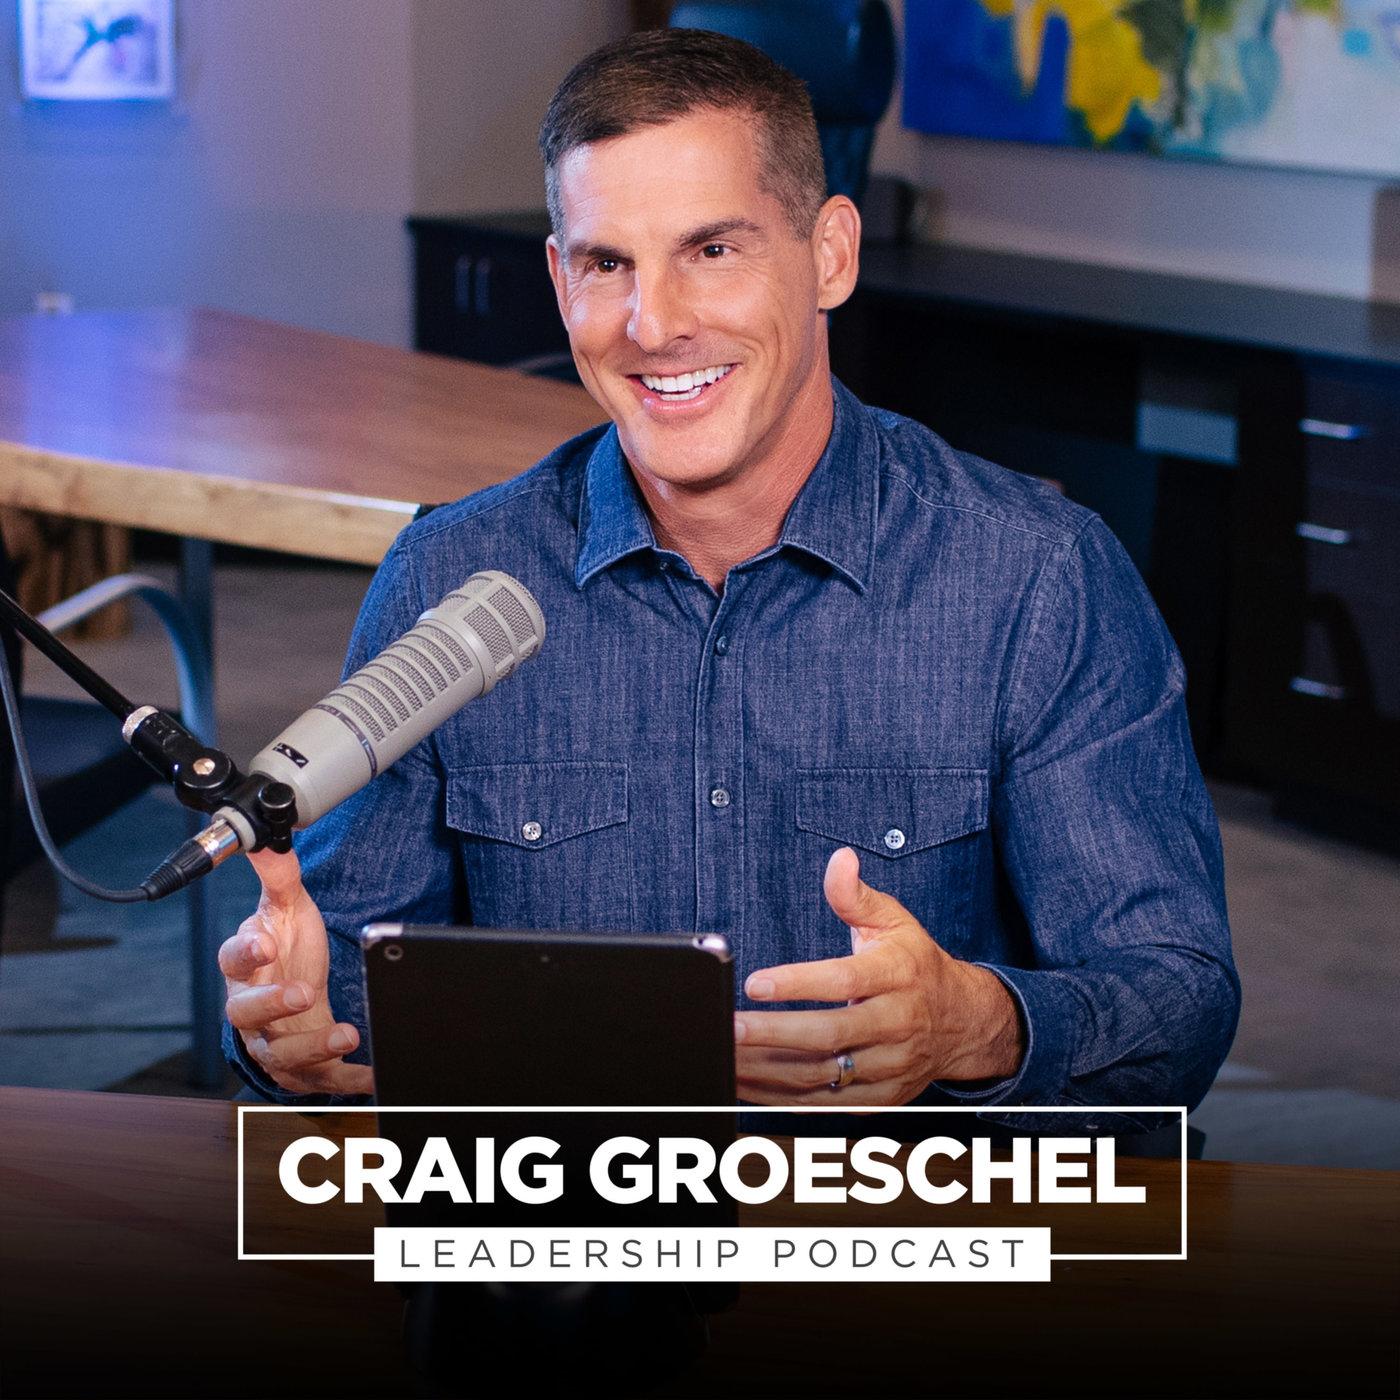 Craig Groeschel Leadership Podcast   Life Church